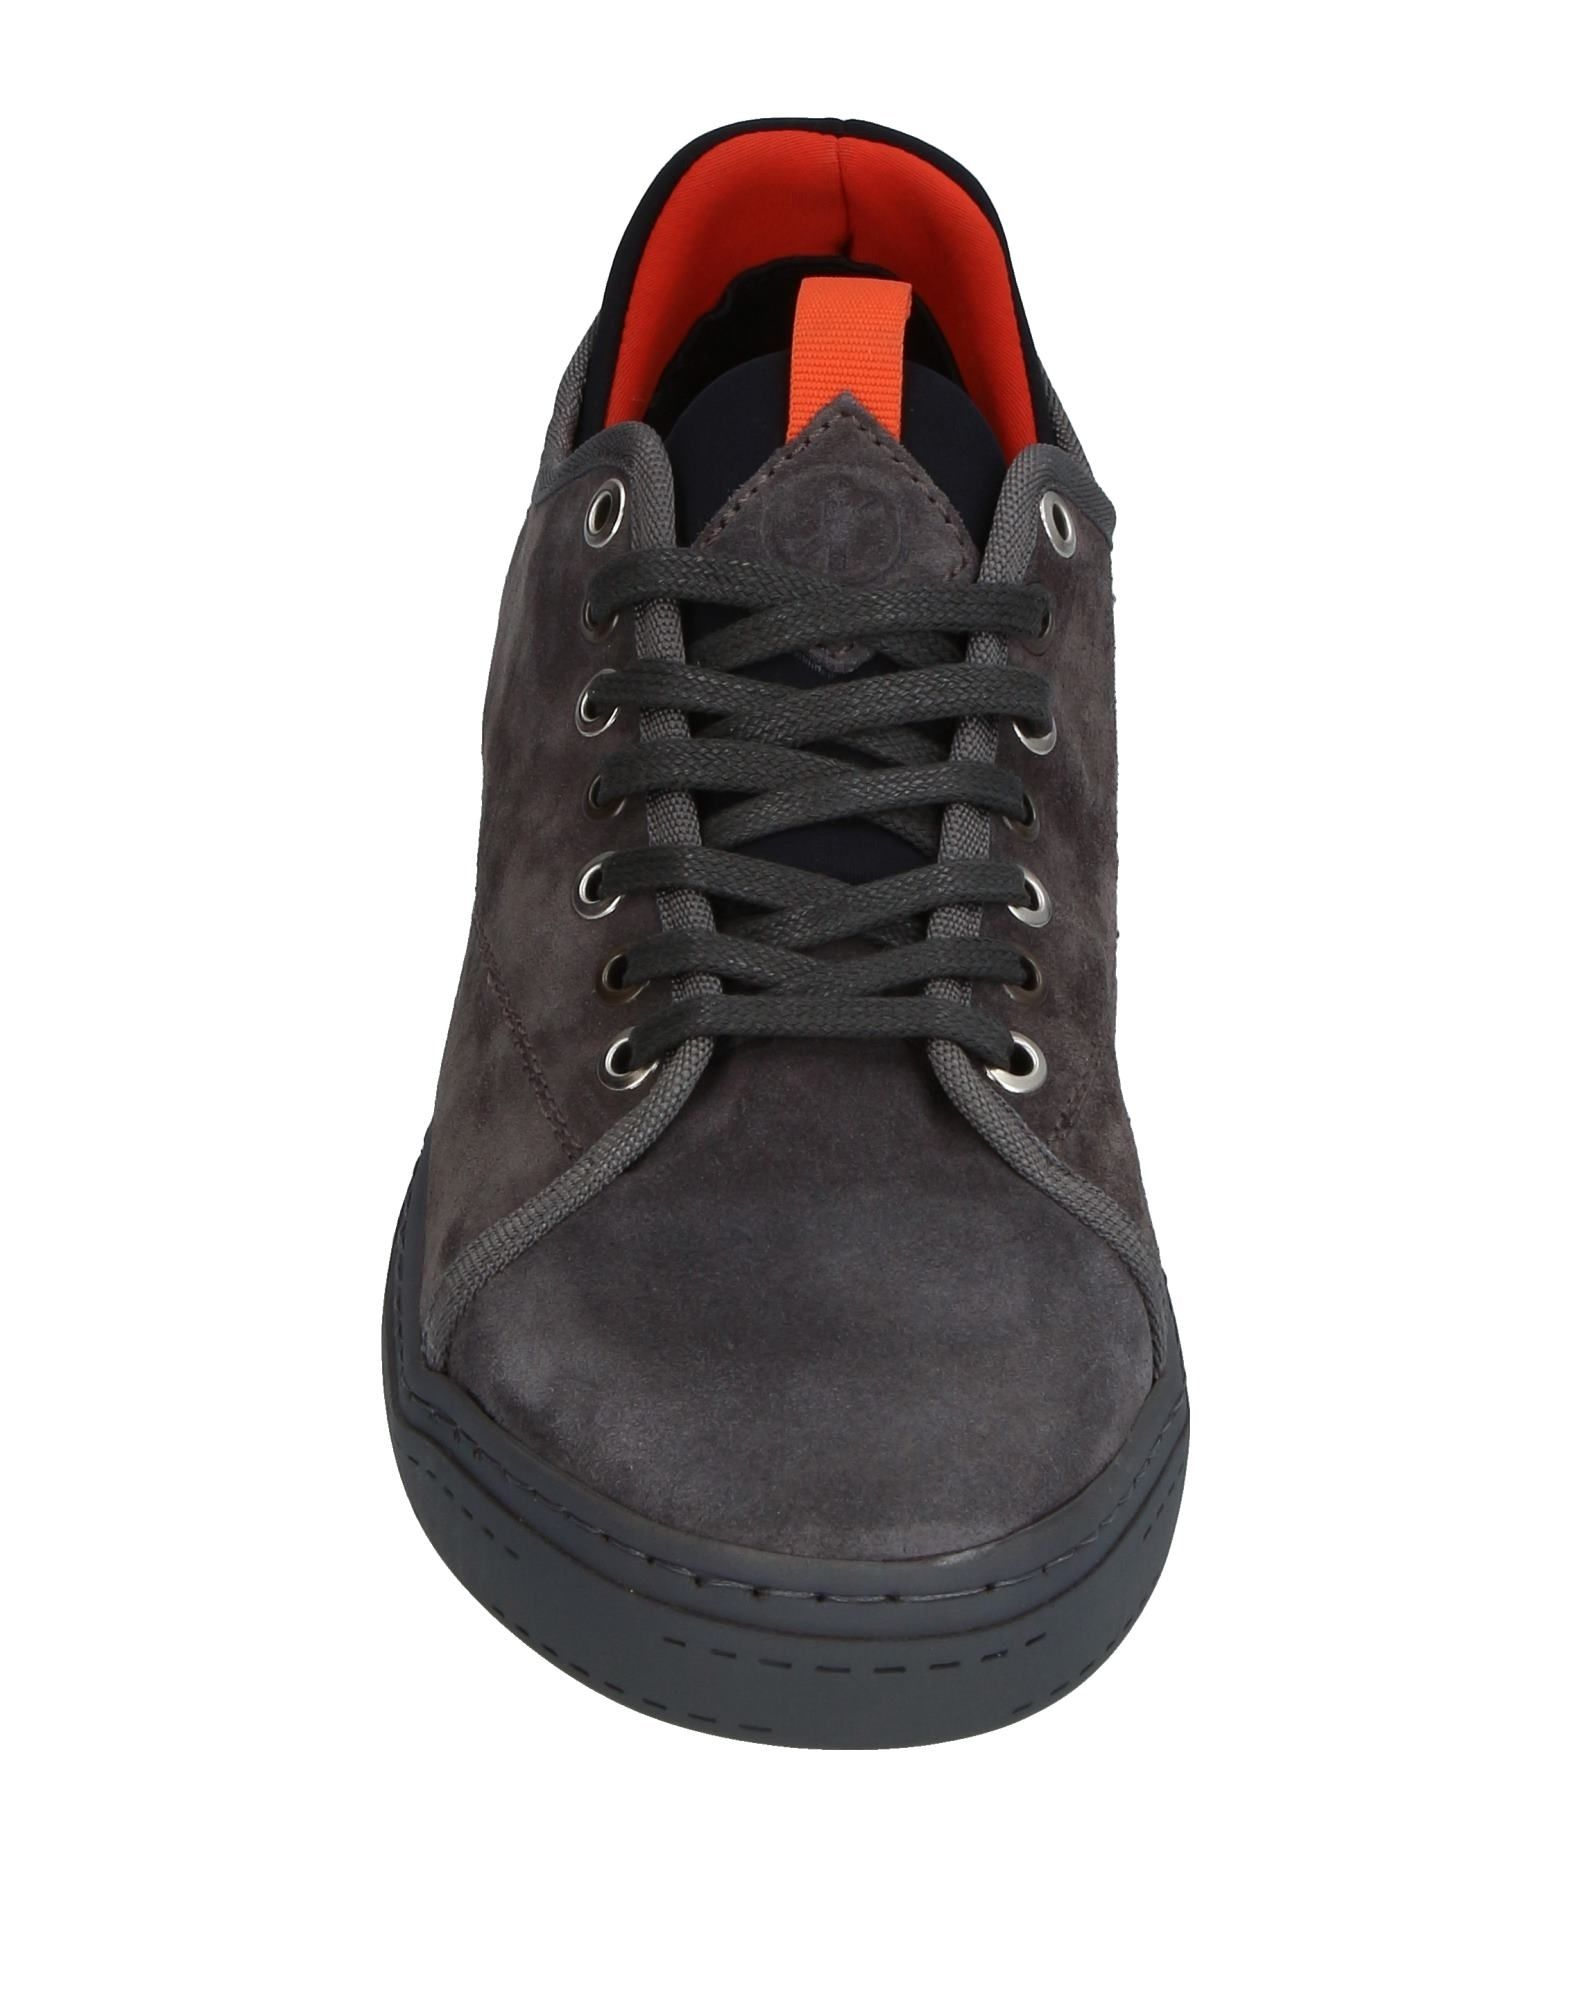 Rabatt echte Schuhe Herren Cafènoir Sneakers Herren Schuhe  11265905ND 4fe97c